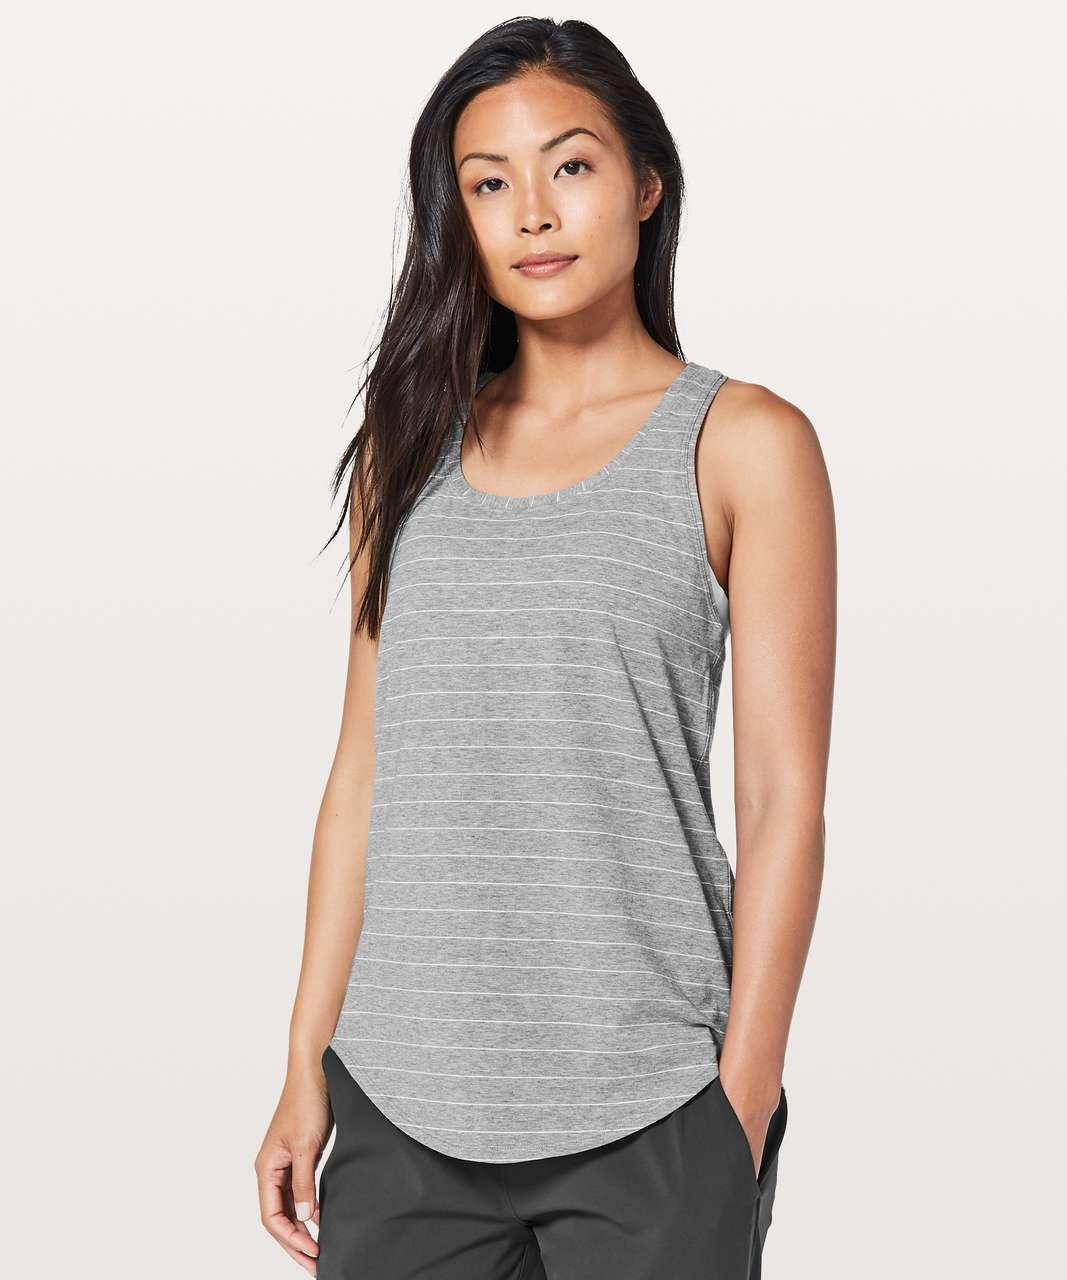 Lululemon Love Tank *Pleated - Short Serve Stripe Heathered Medium Grey White